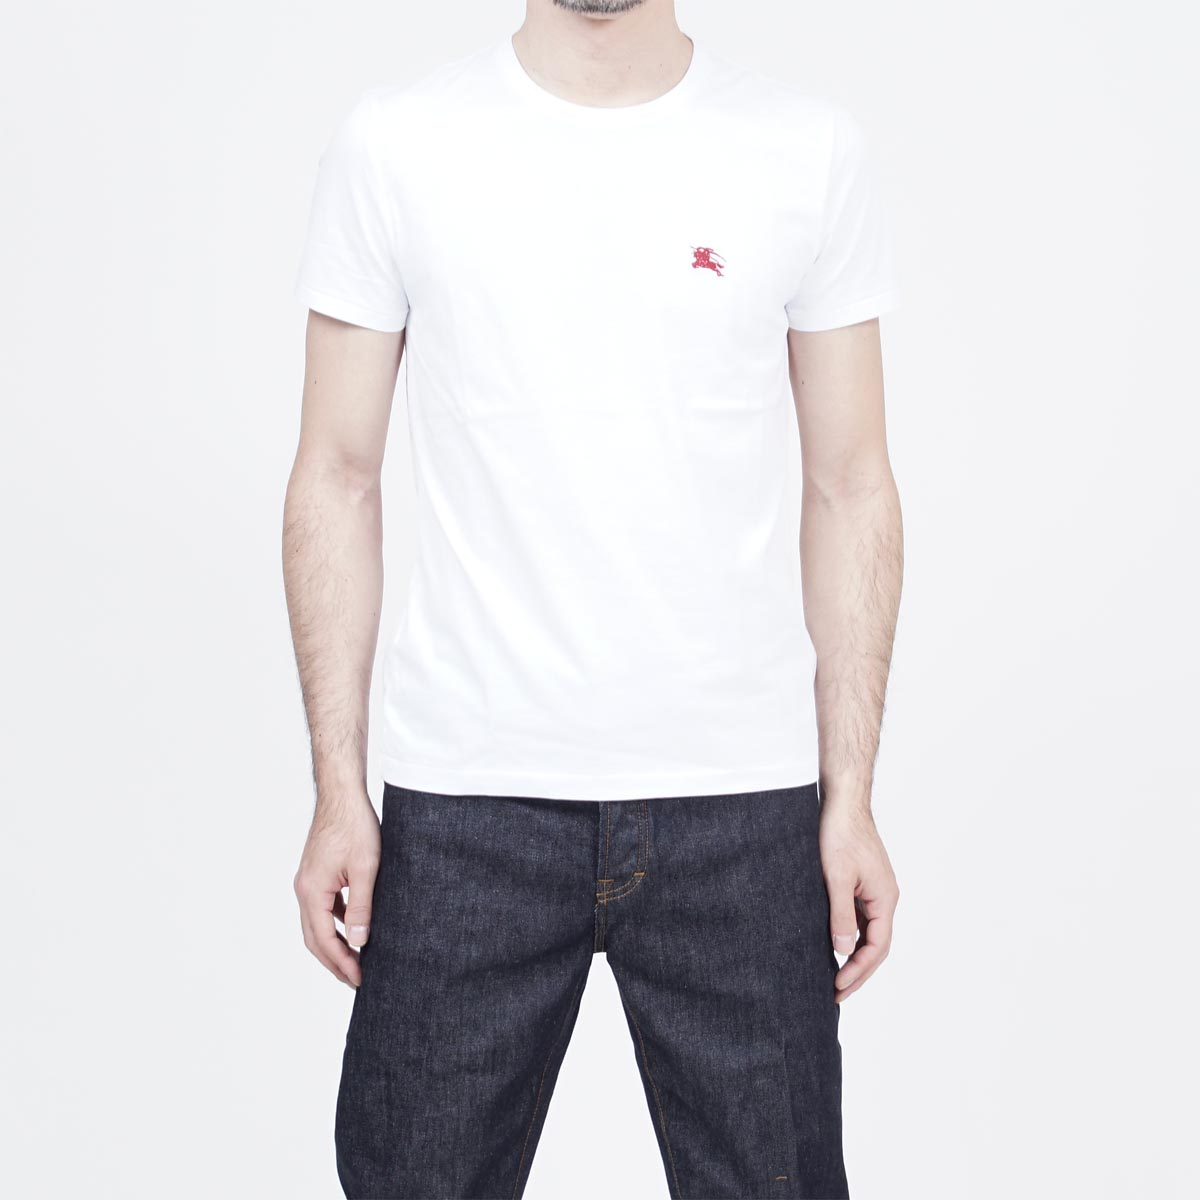 Burberry BURBERRY crew neck T-shirt WHITE white system 3962490 optic white men